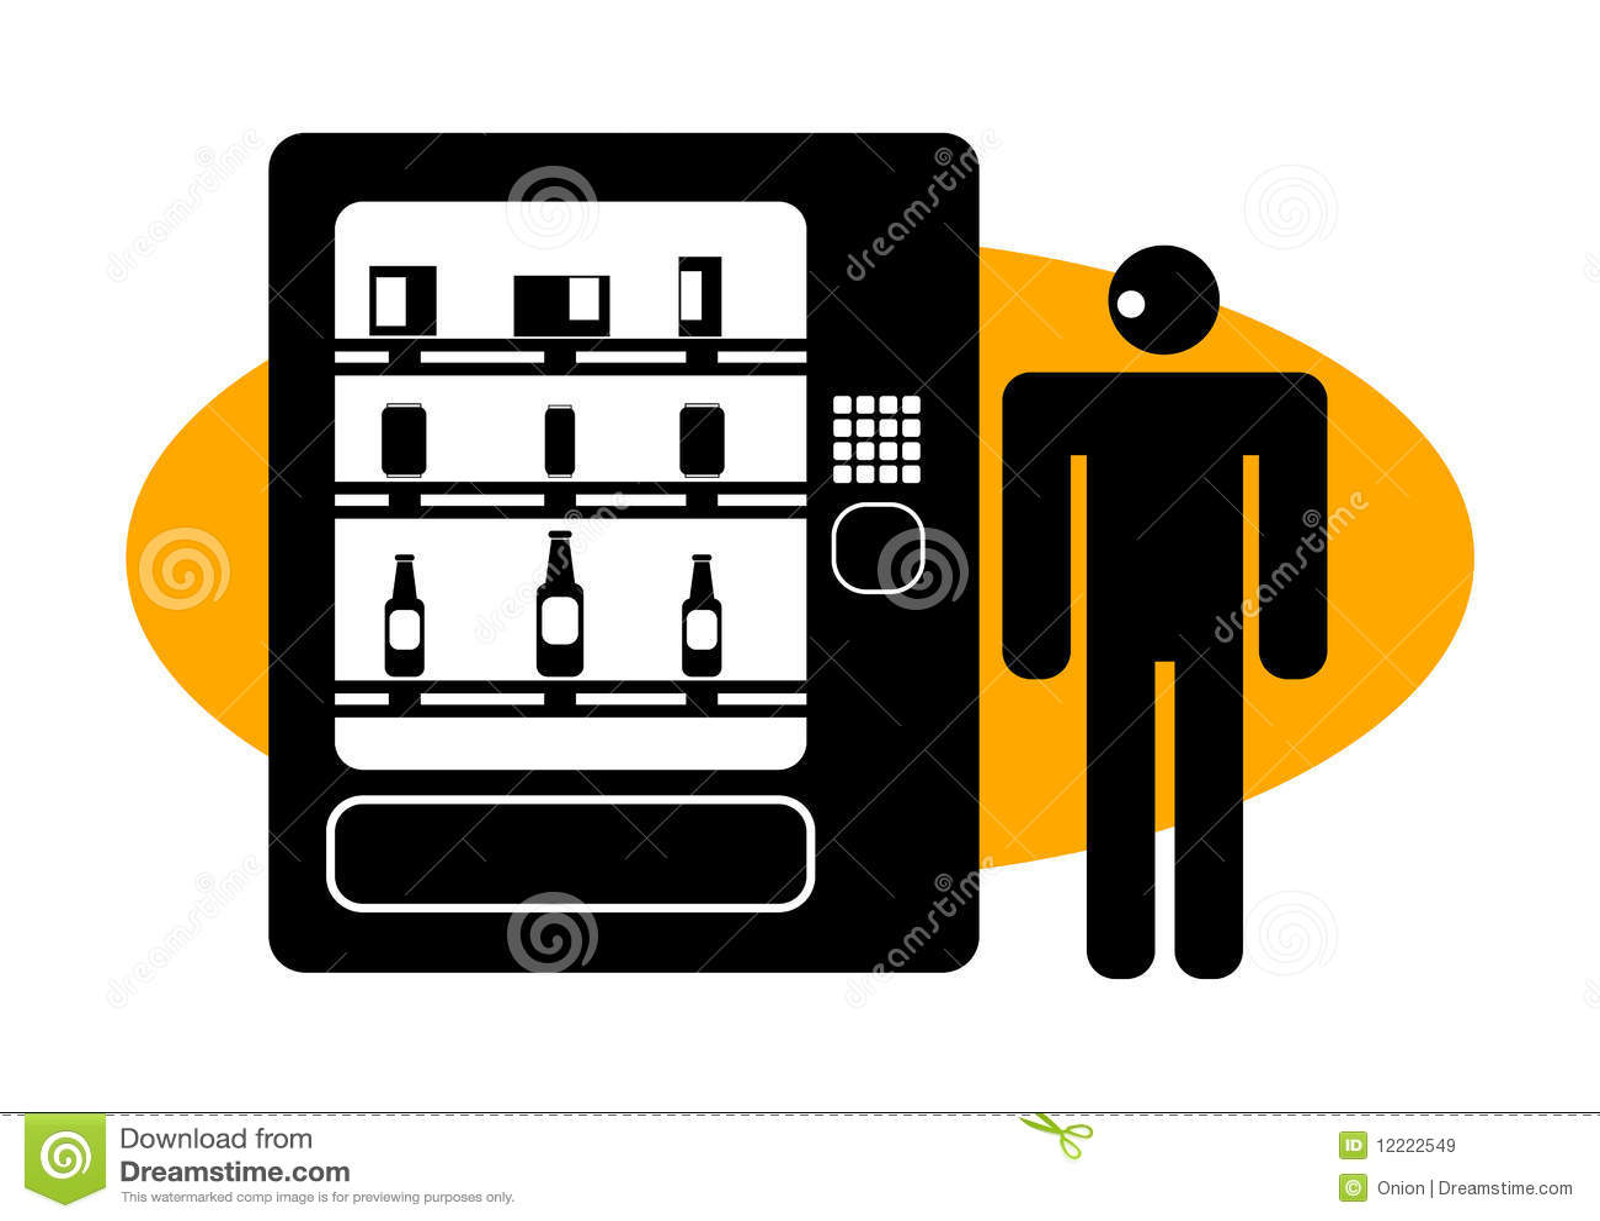 vending machine business plan malaysia map